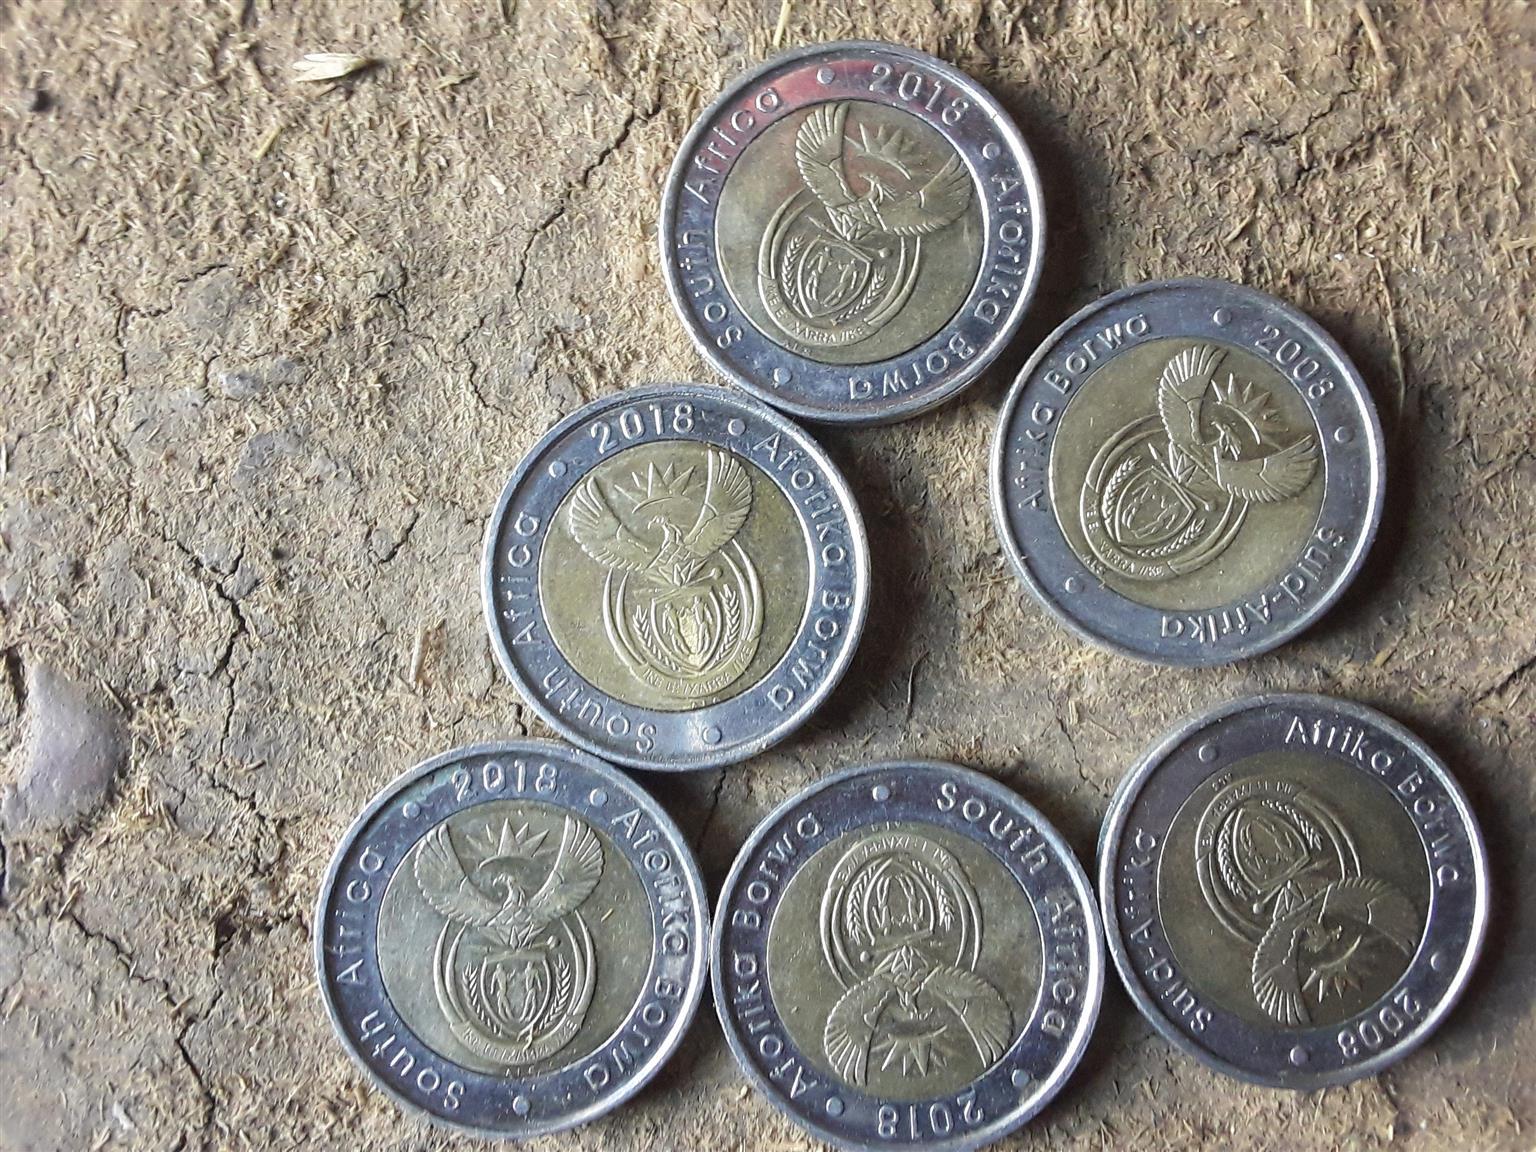 Mandela coins available